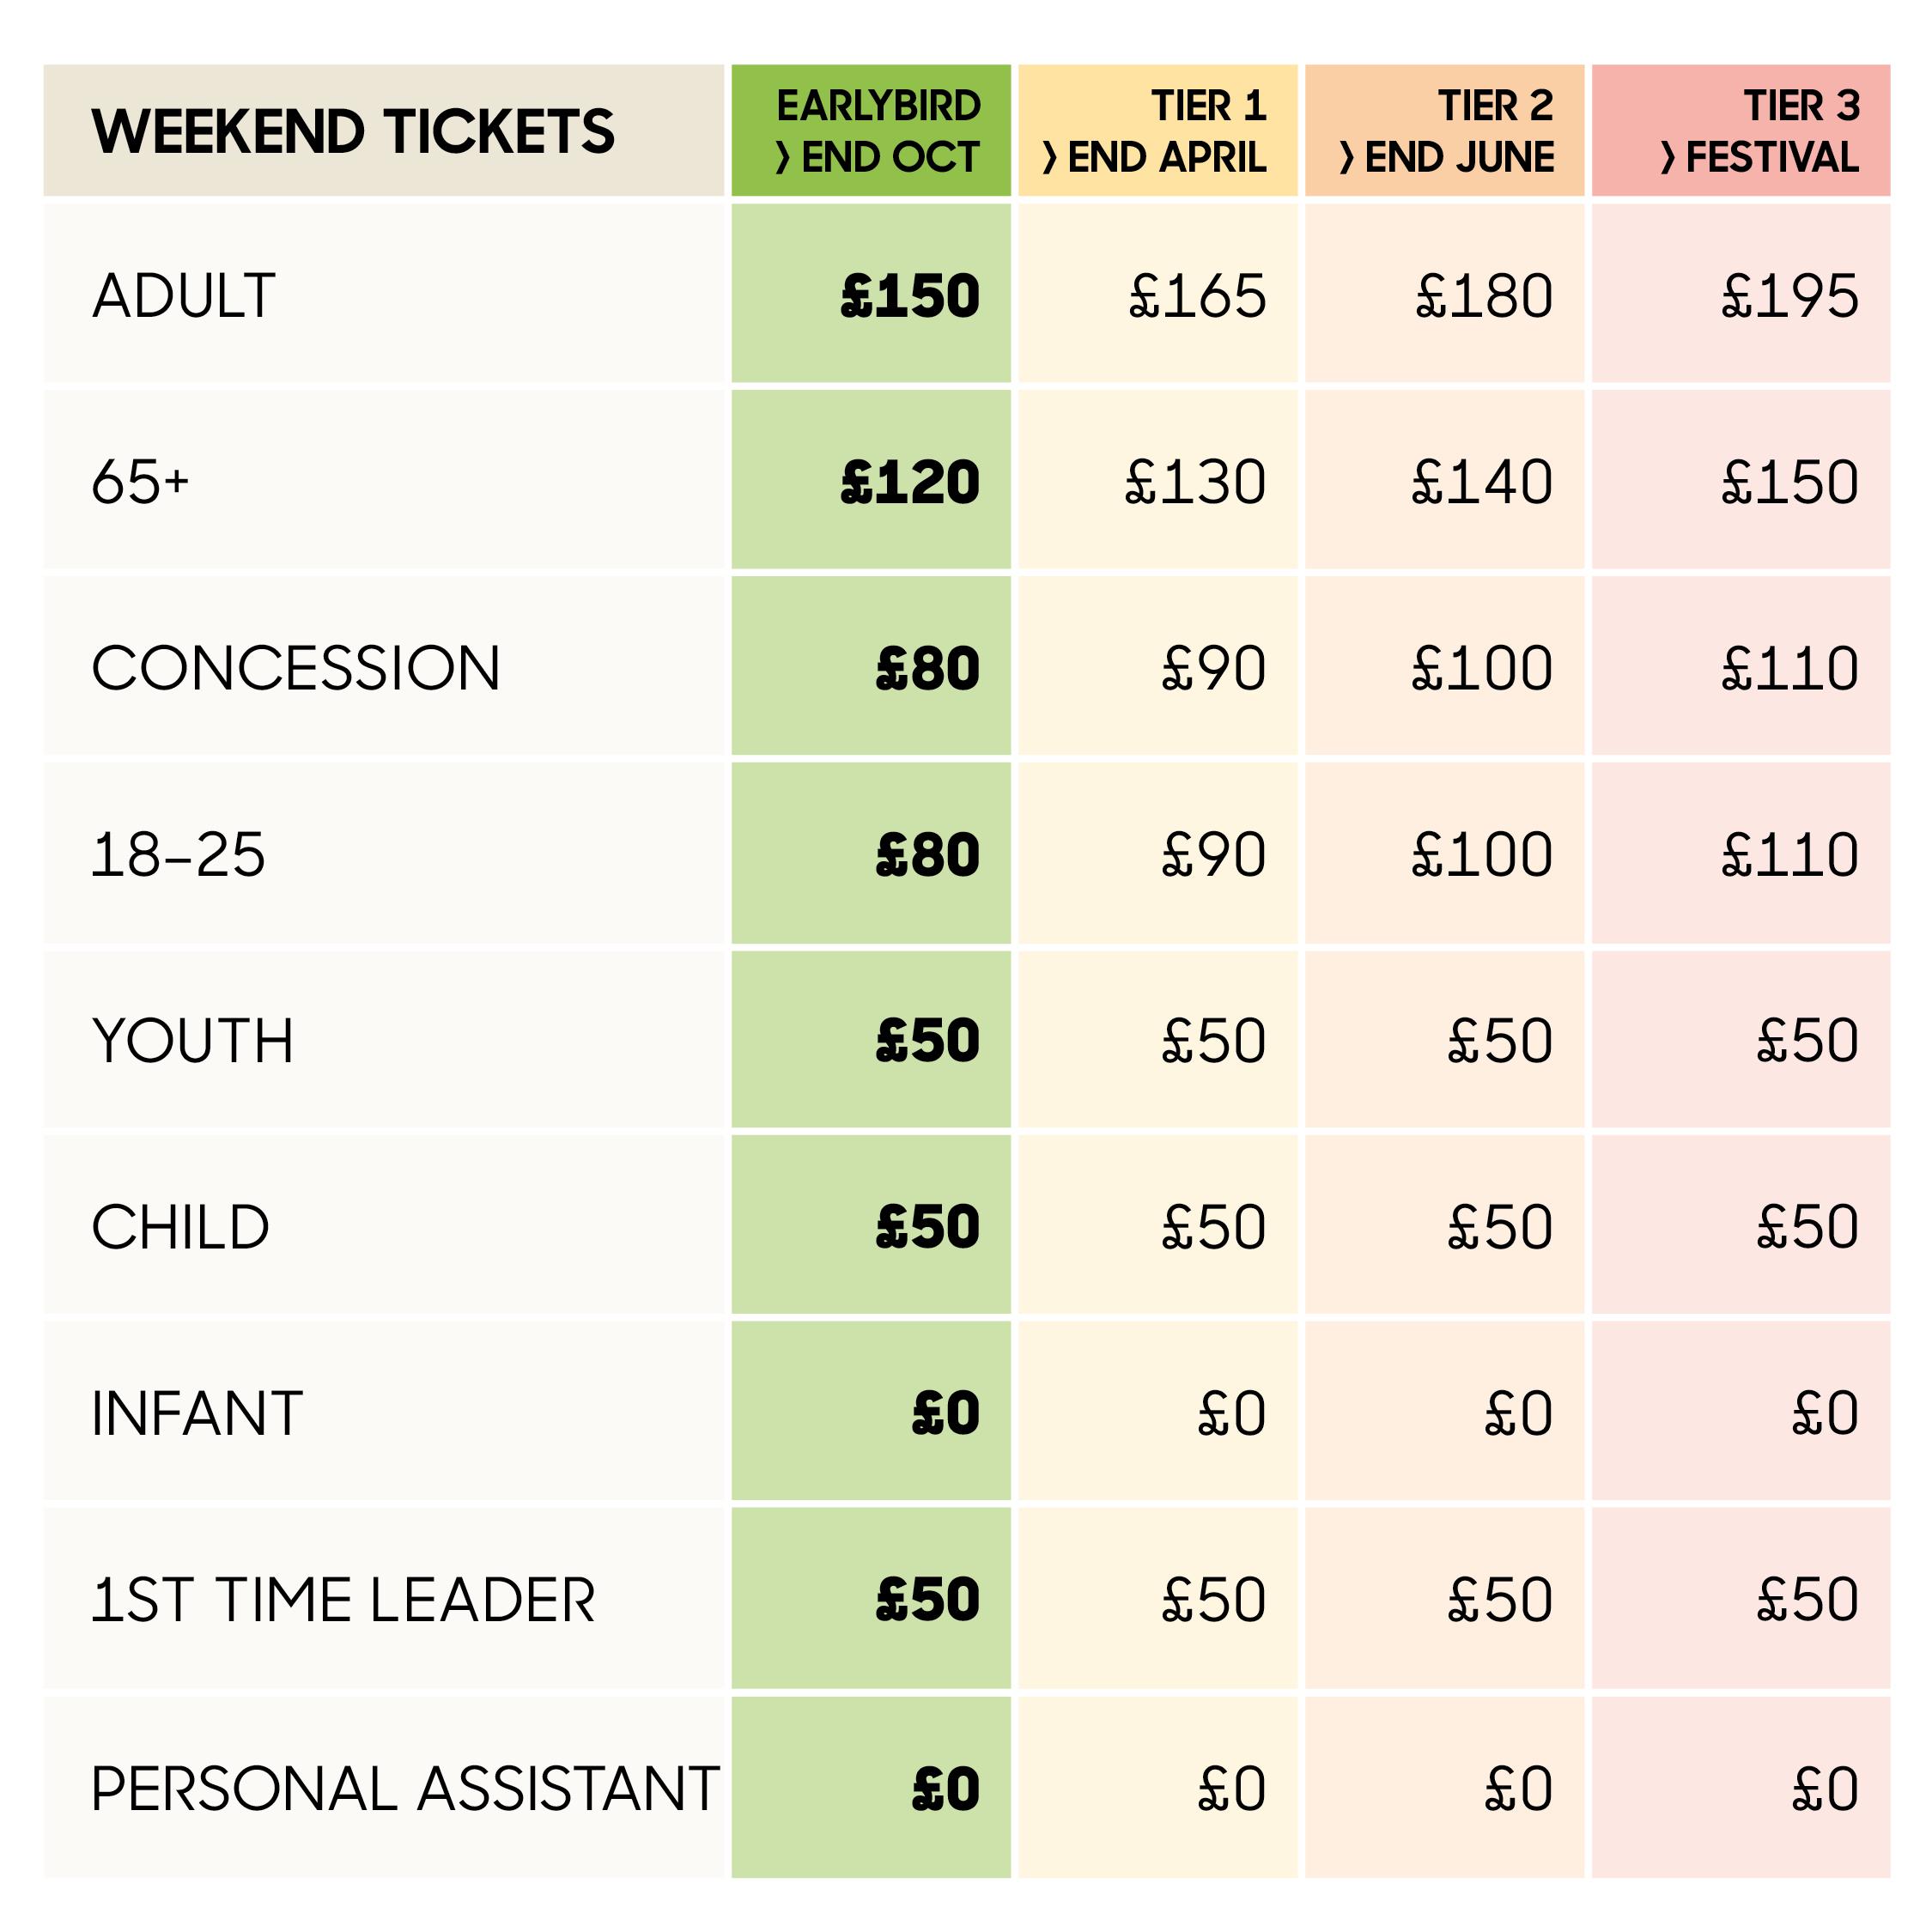 2021 Earlybird Weekend Tickets